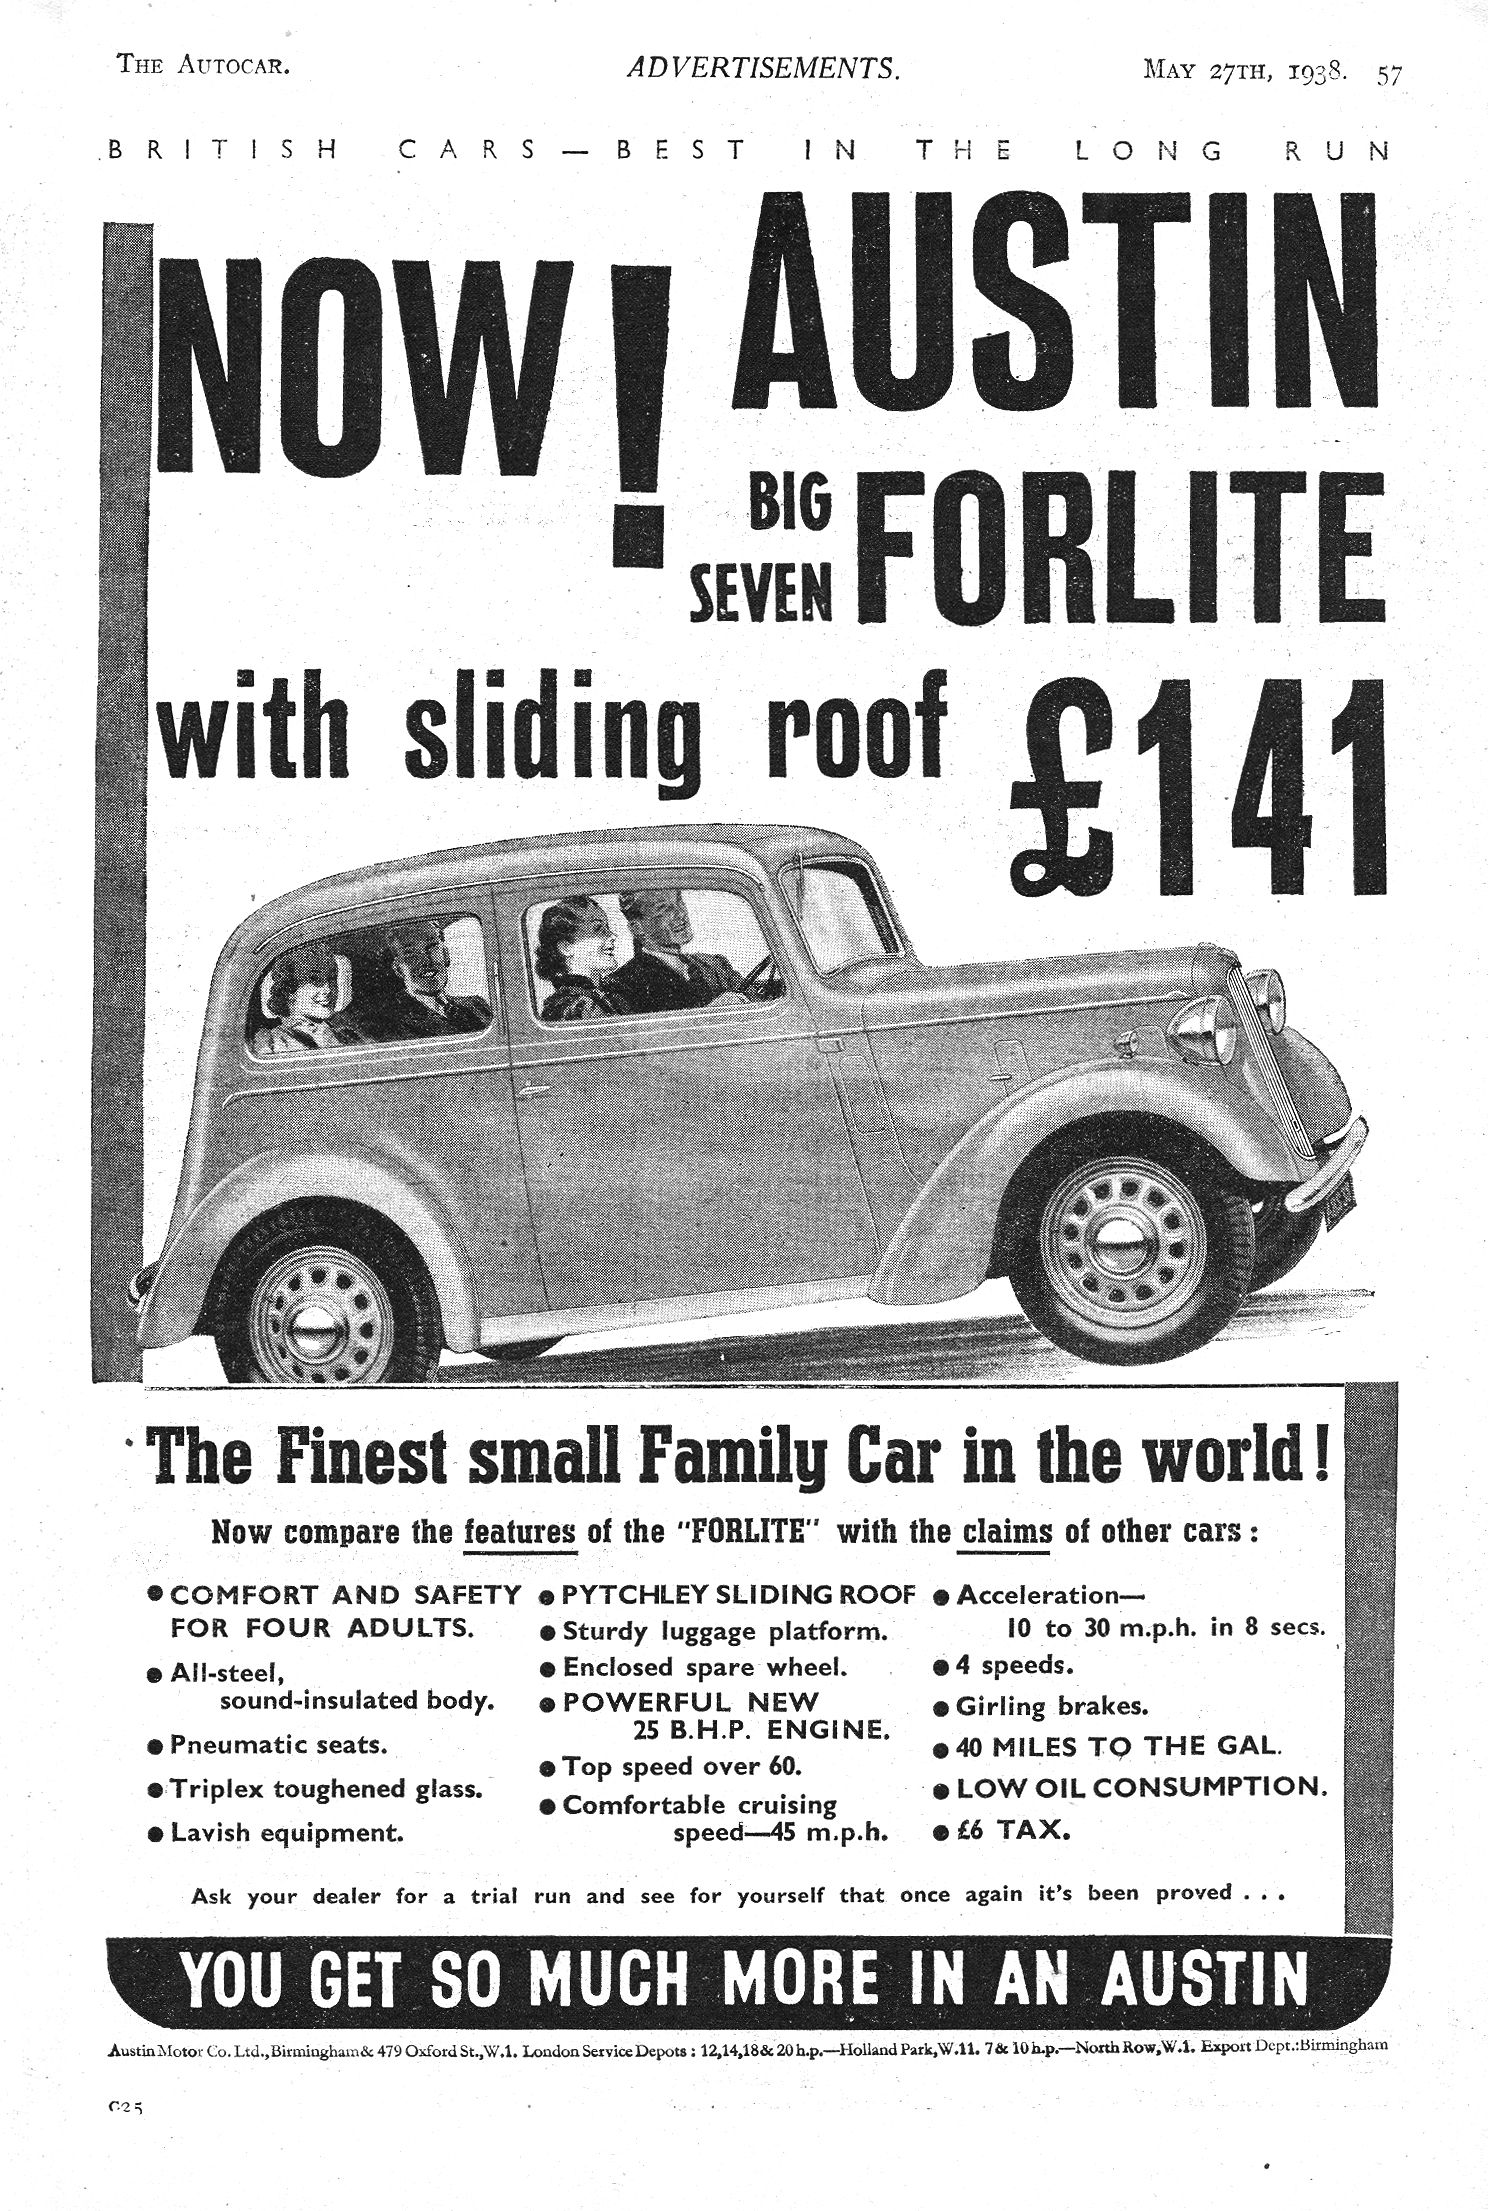 Austin car autocar advert 1938 big seven forlite